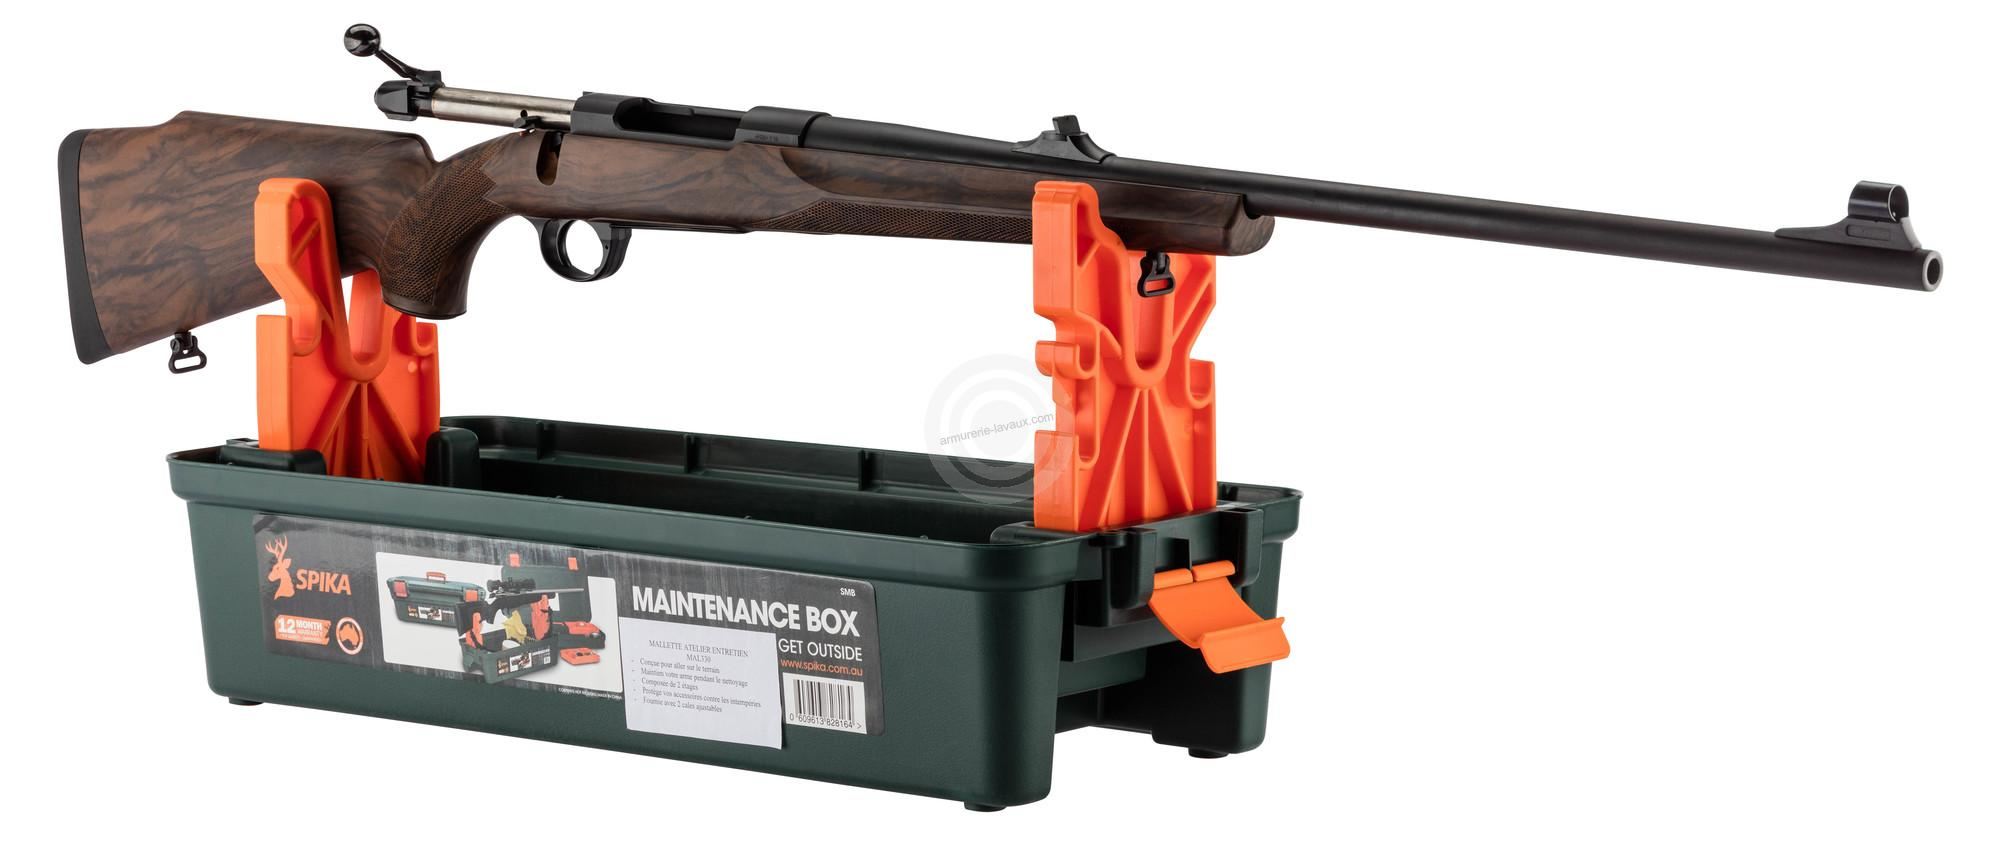 Chevalet de tir SPIKA et mallette entretien